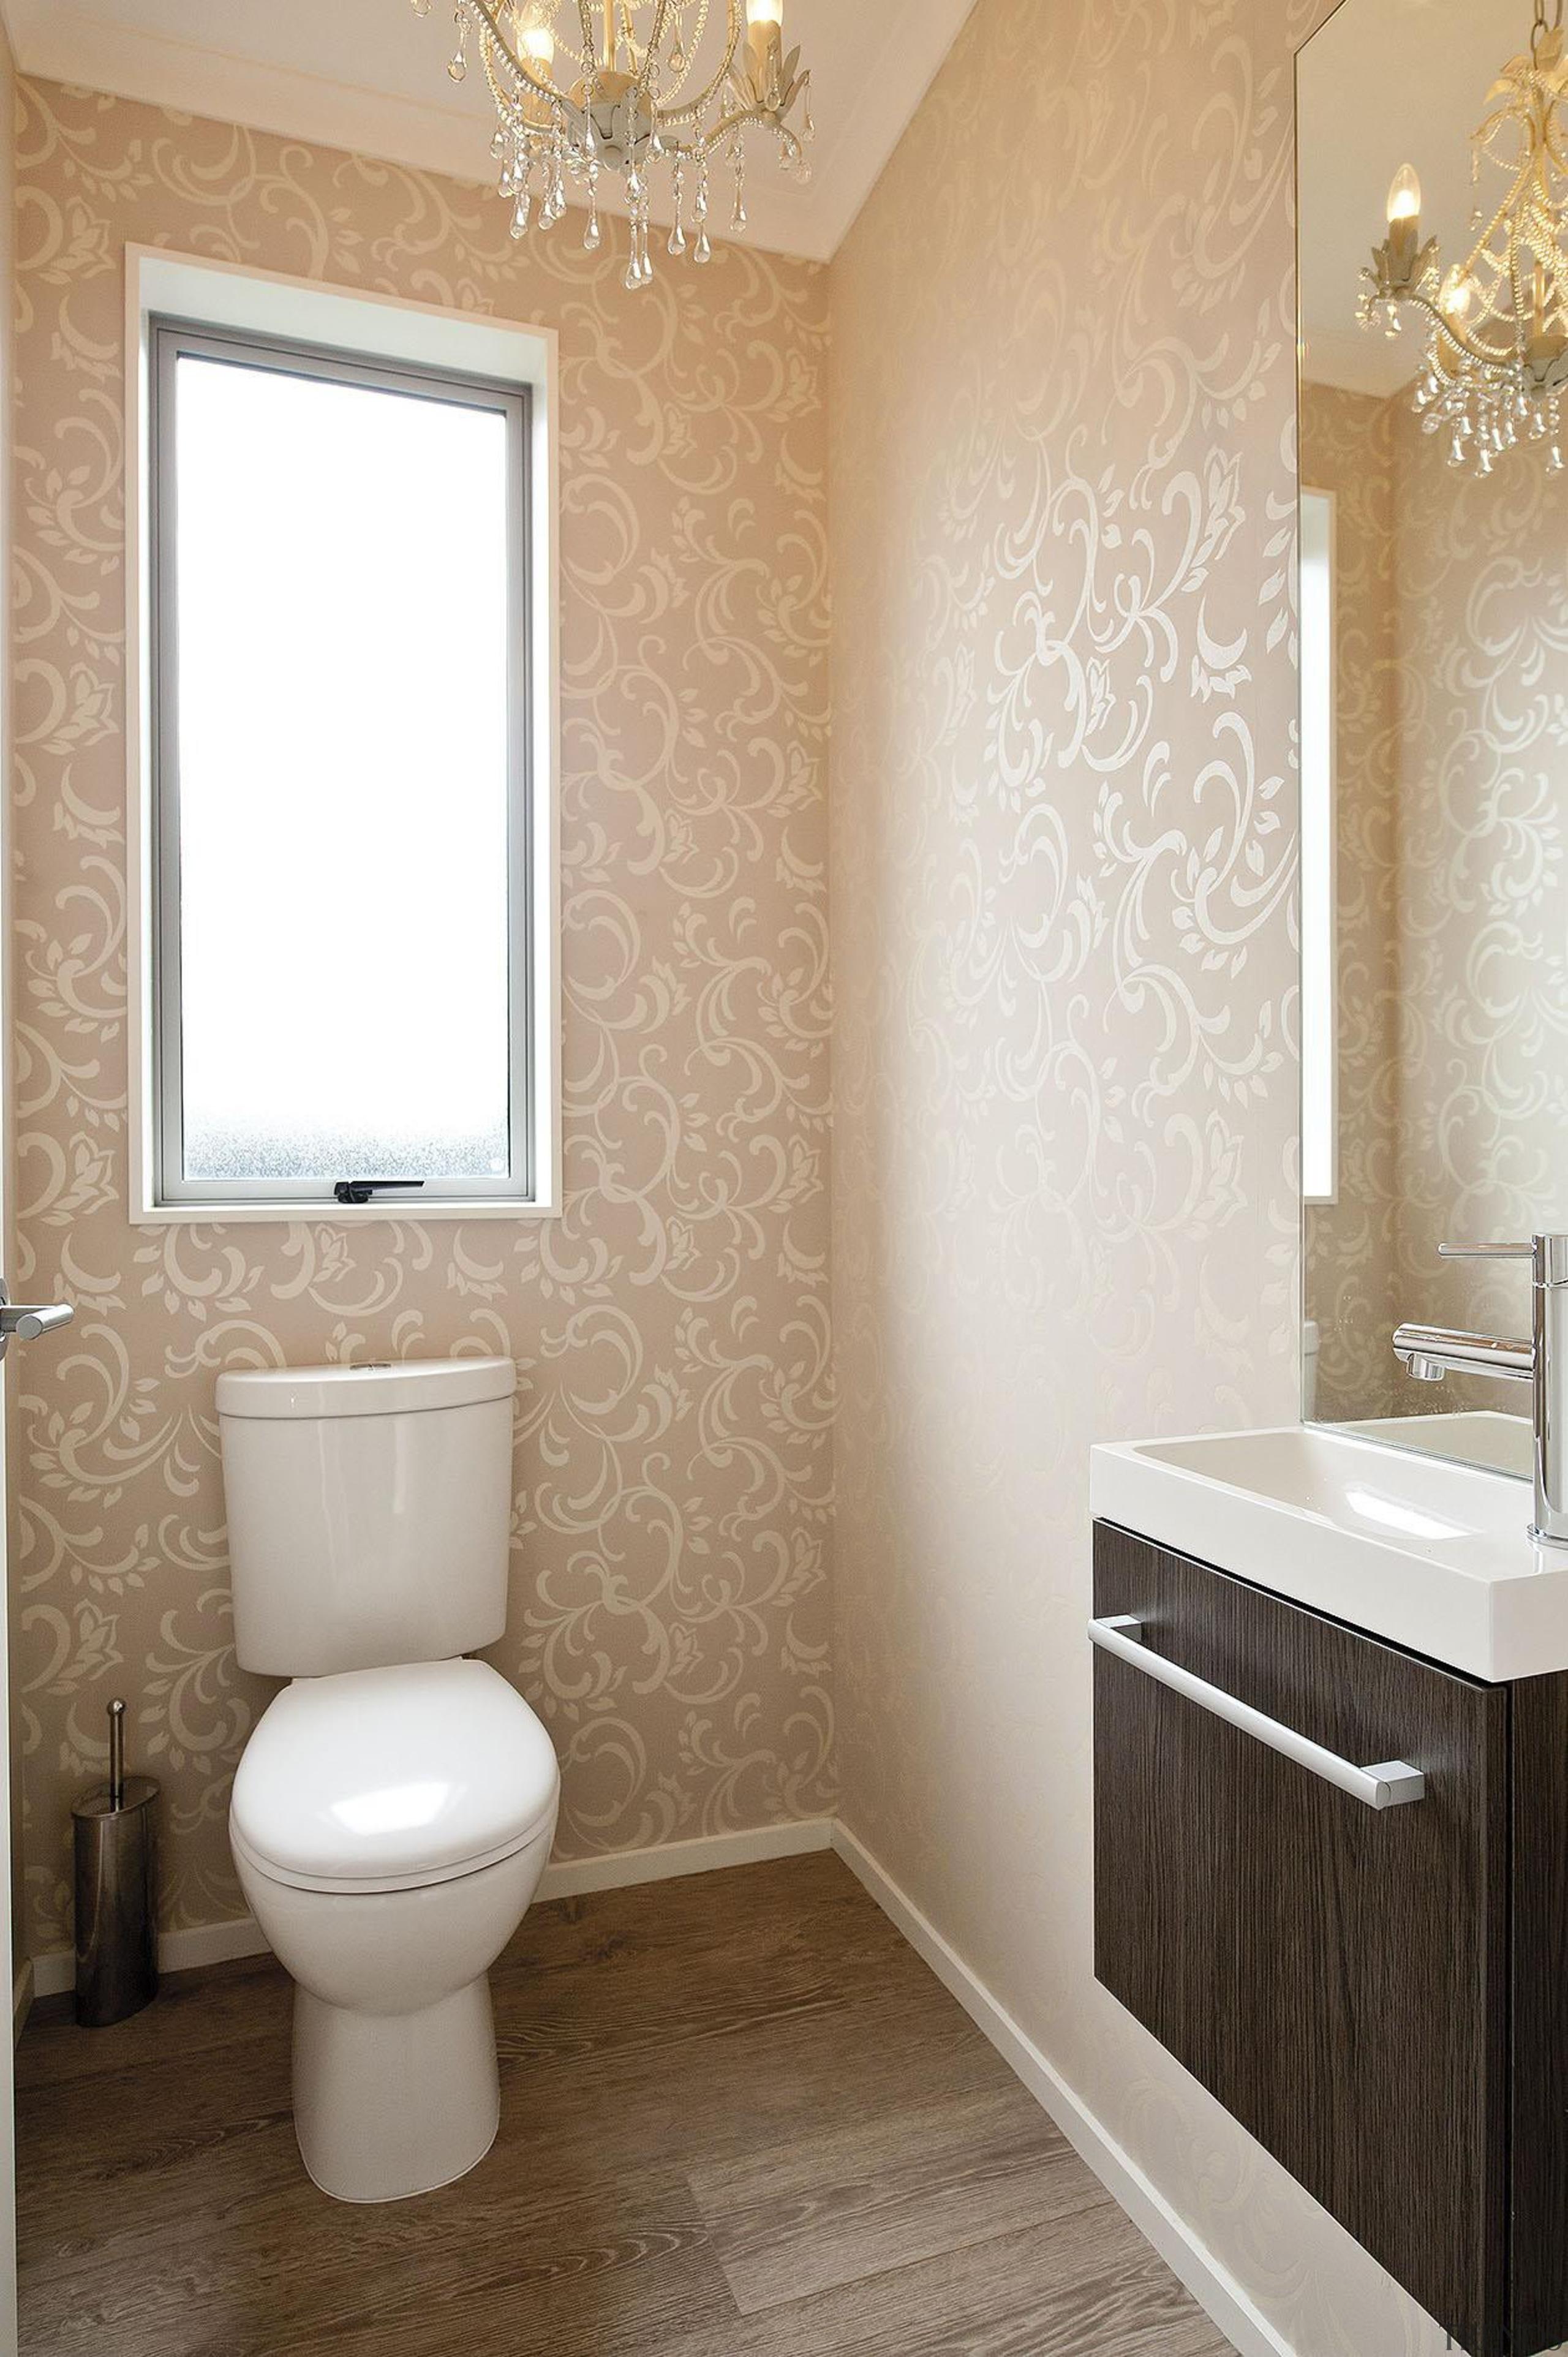 For more information, please visit www.gjgardner.co.nz bathroom, bathroom accessory, bathroom cabinet, bathroom sink, bidet, ceramic, floor, flooring, home, interior design, plumbing fixture, room, sink, tile, toilet, toilet seat, wall, white